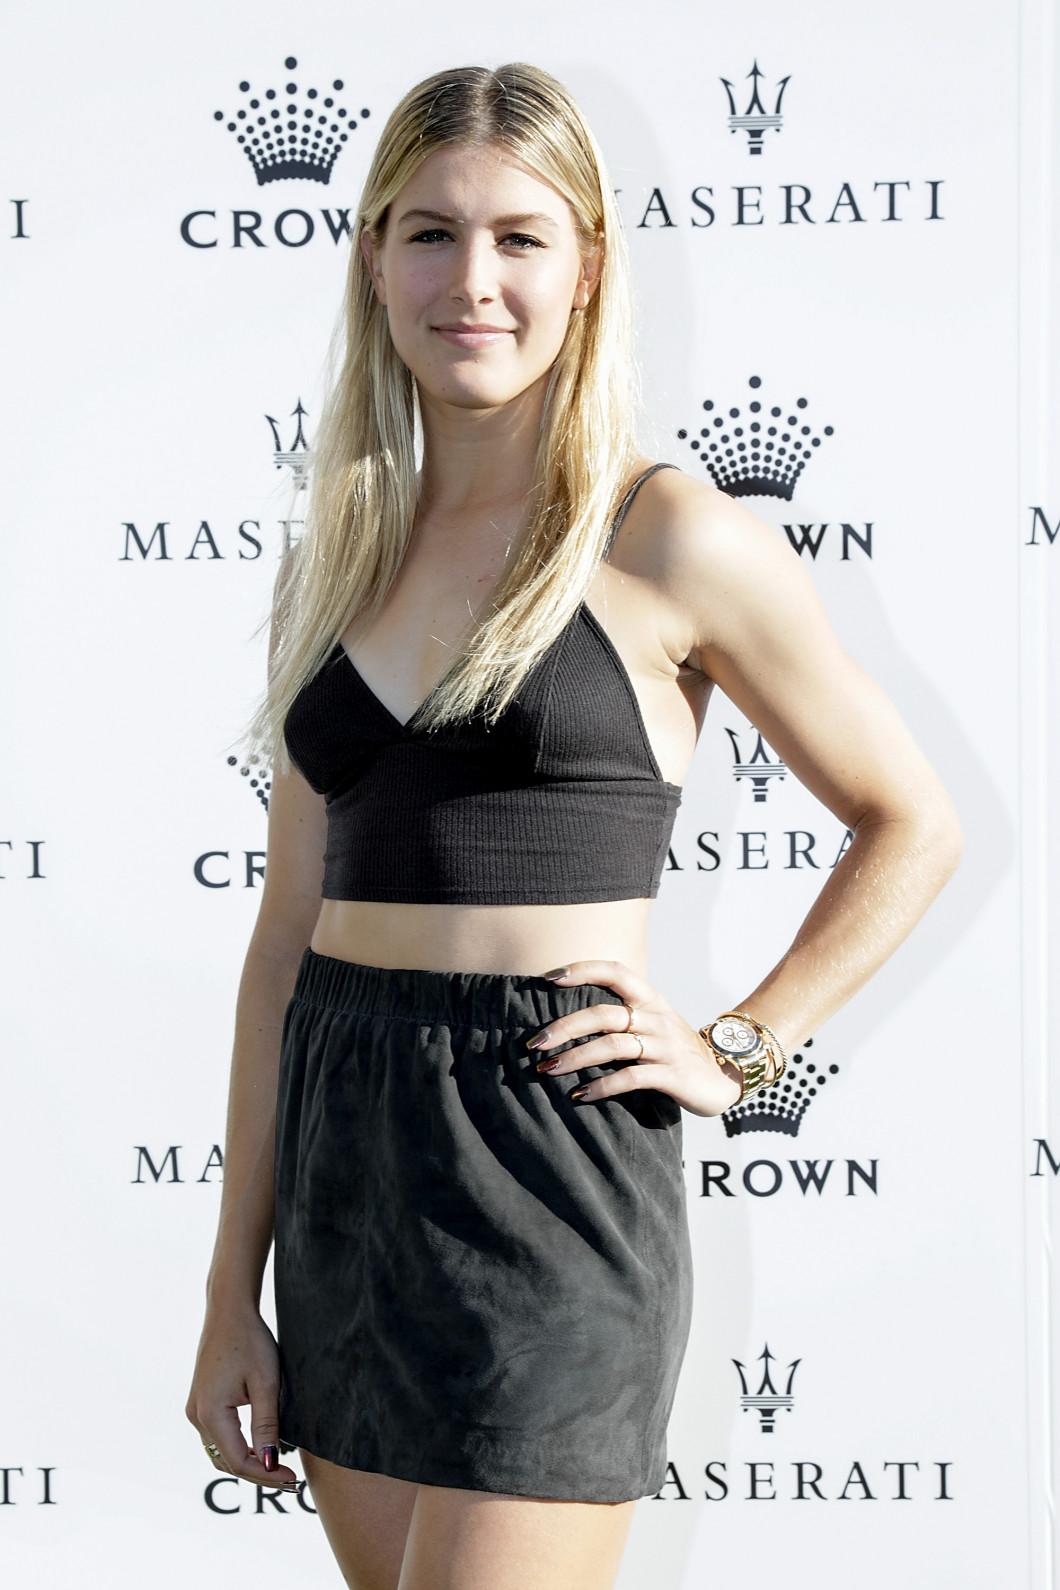 2018 Crown IMG Tennis Player